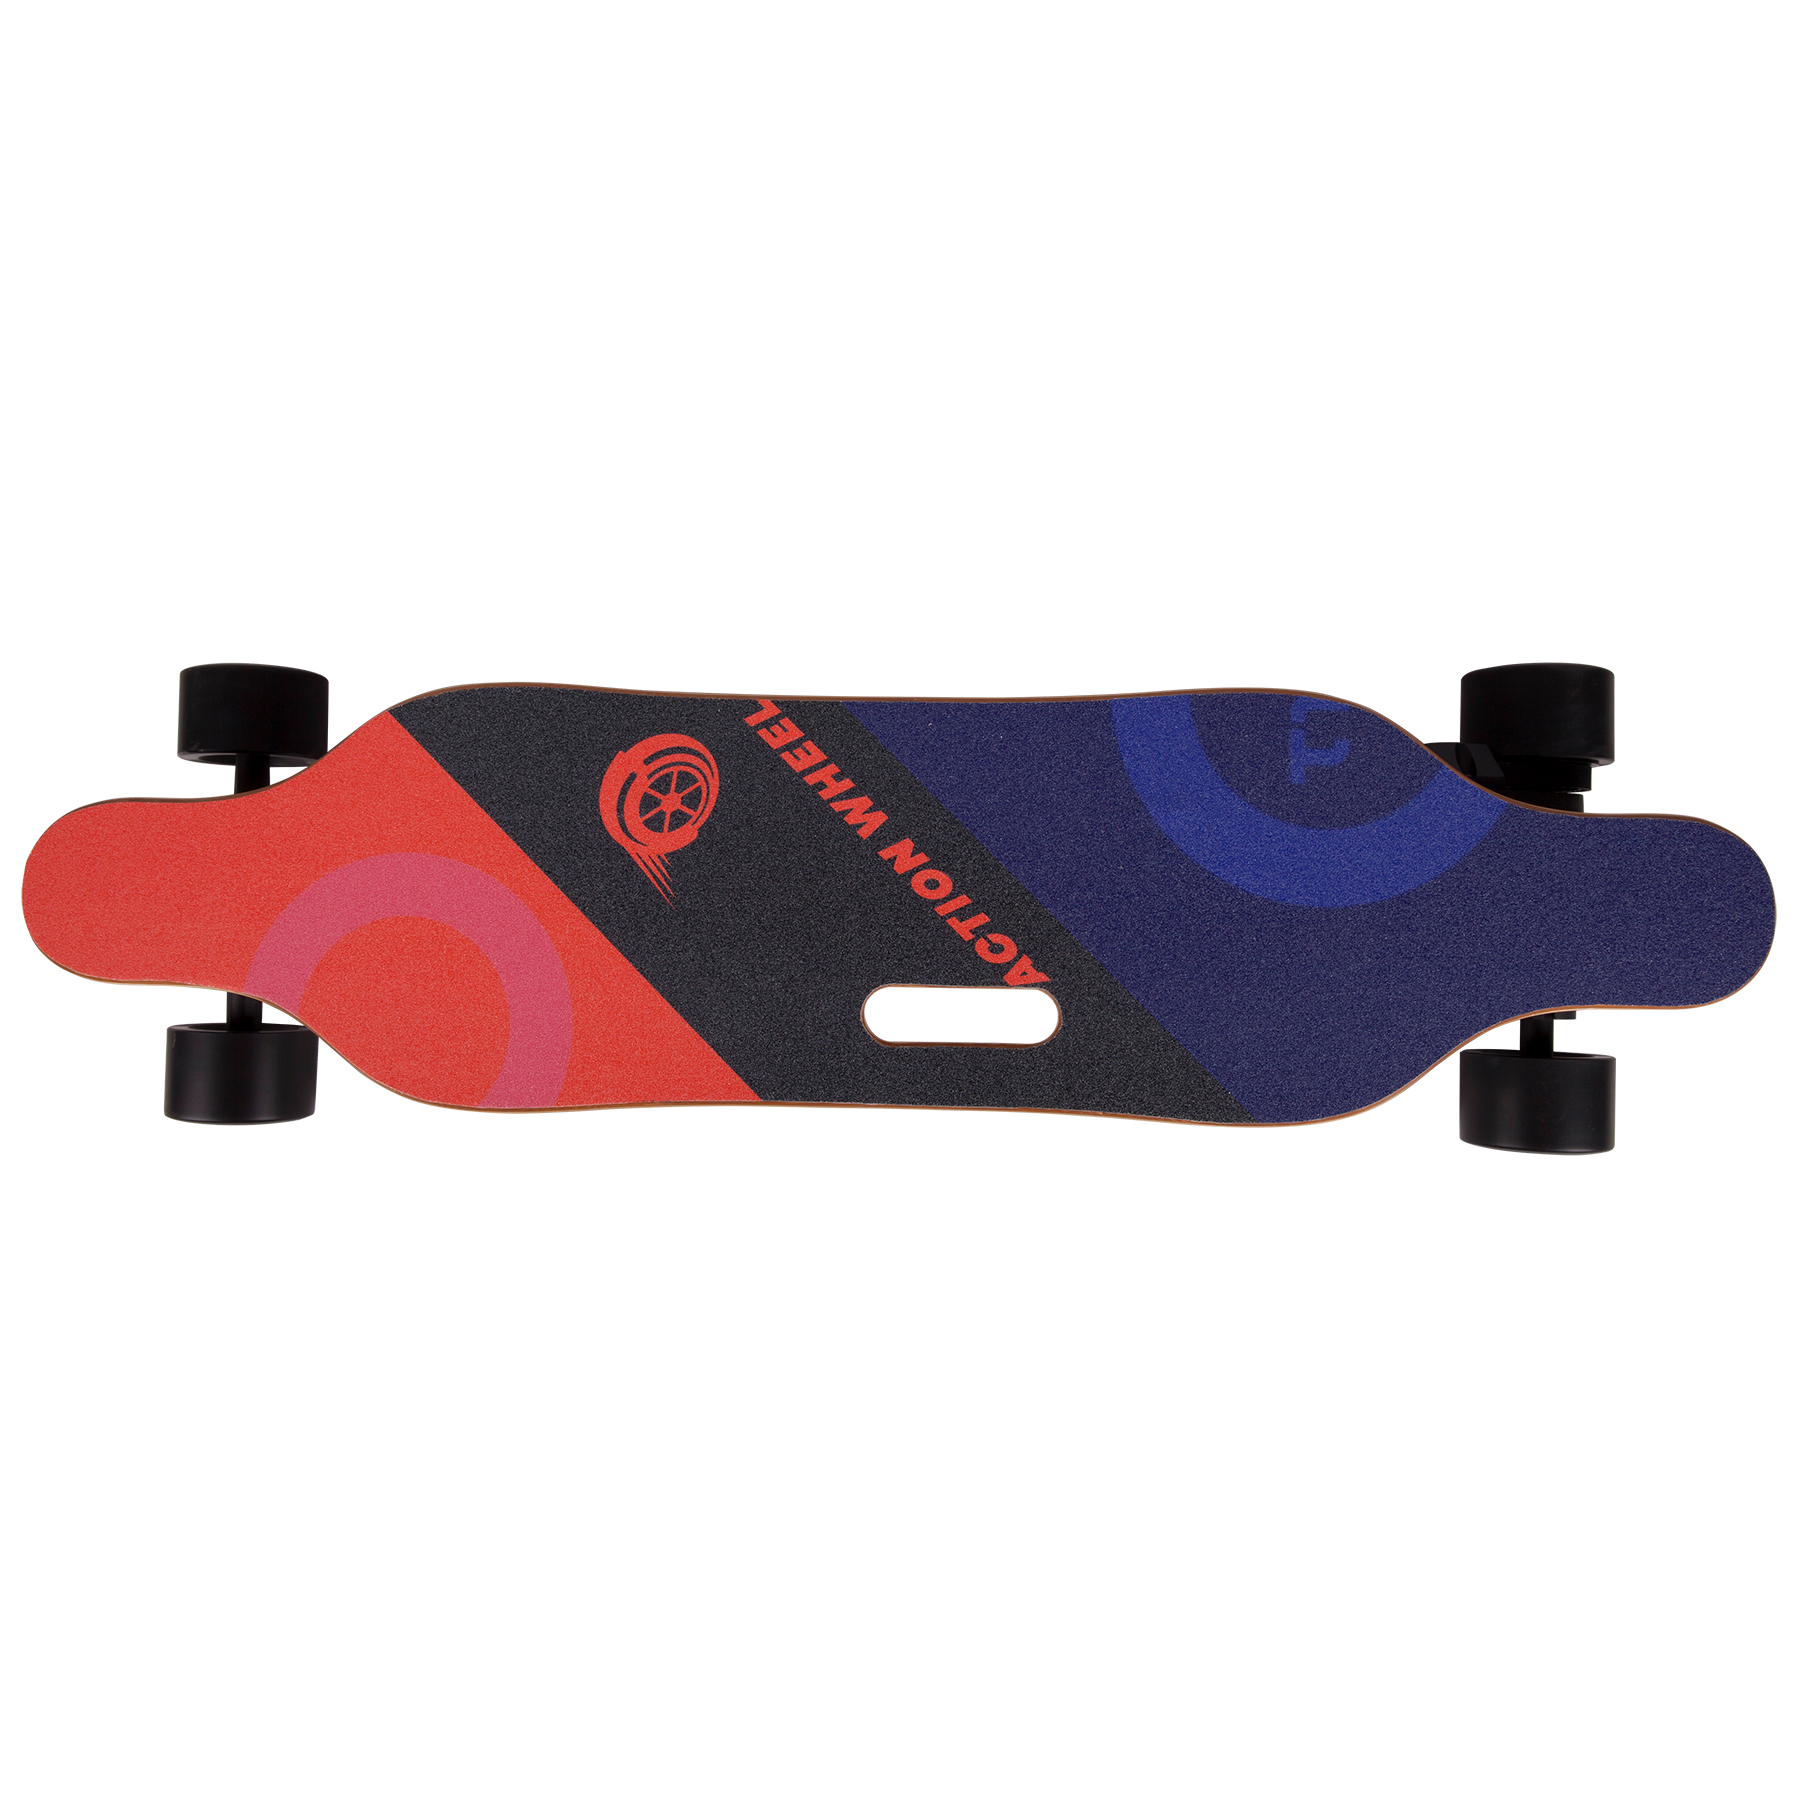 High Quality E-Skateboard Electric Skateboard 930mm